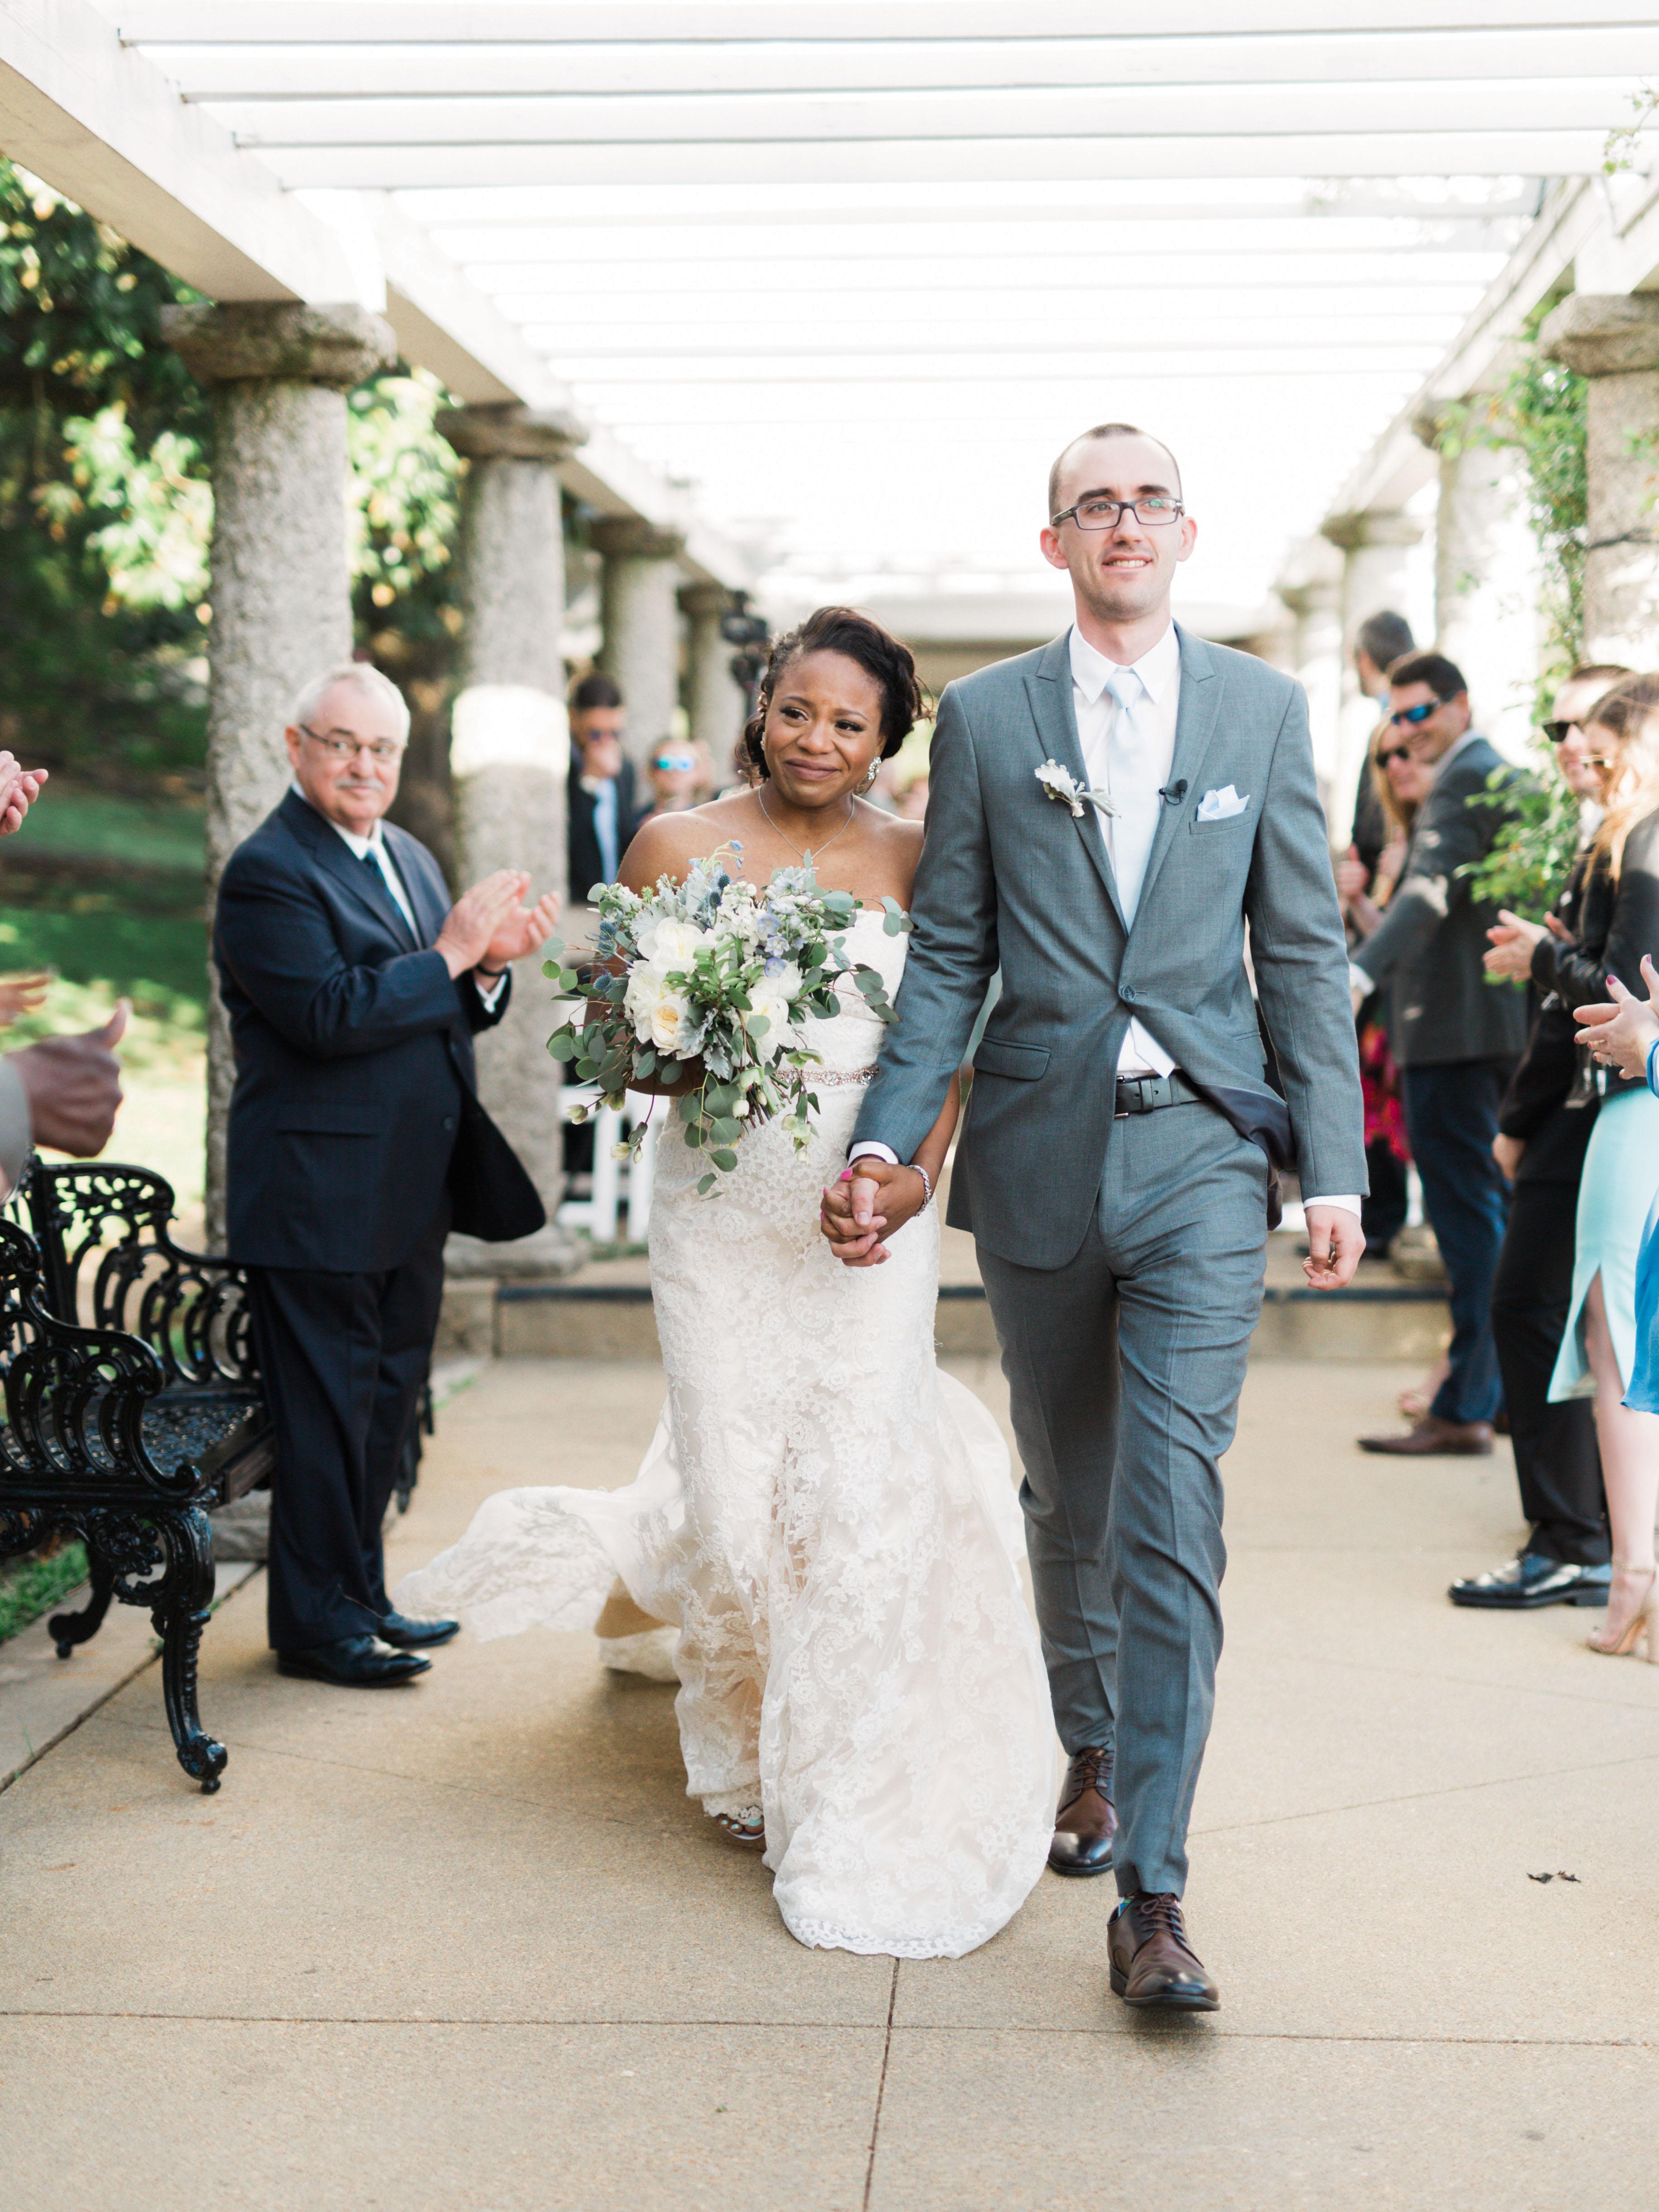 wedding recessional bride groom walk holding hands